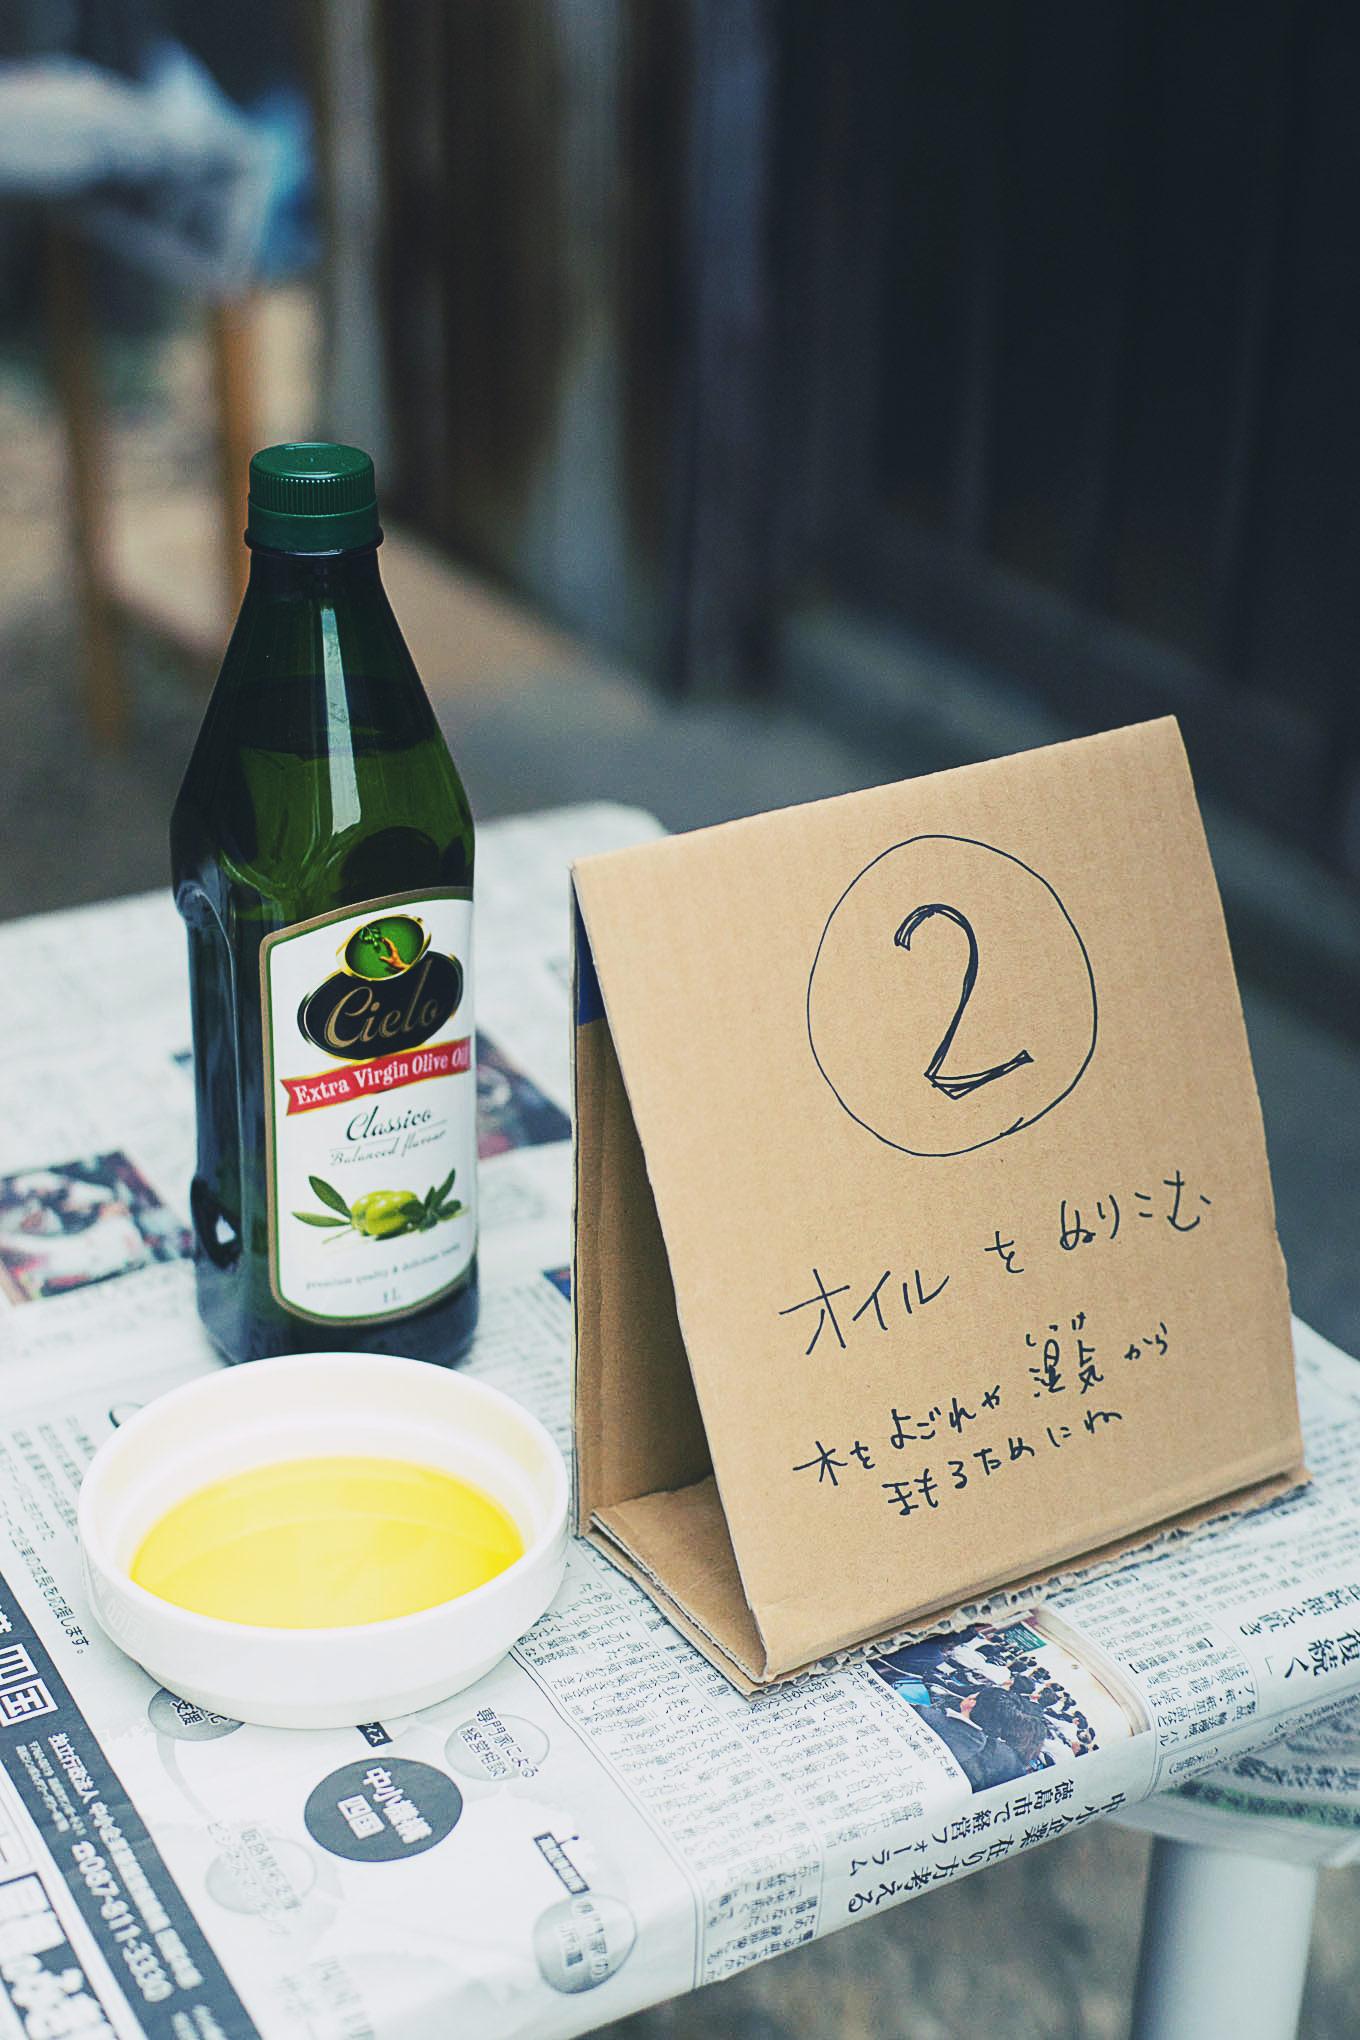 nagaya-ennichi-20151010-12